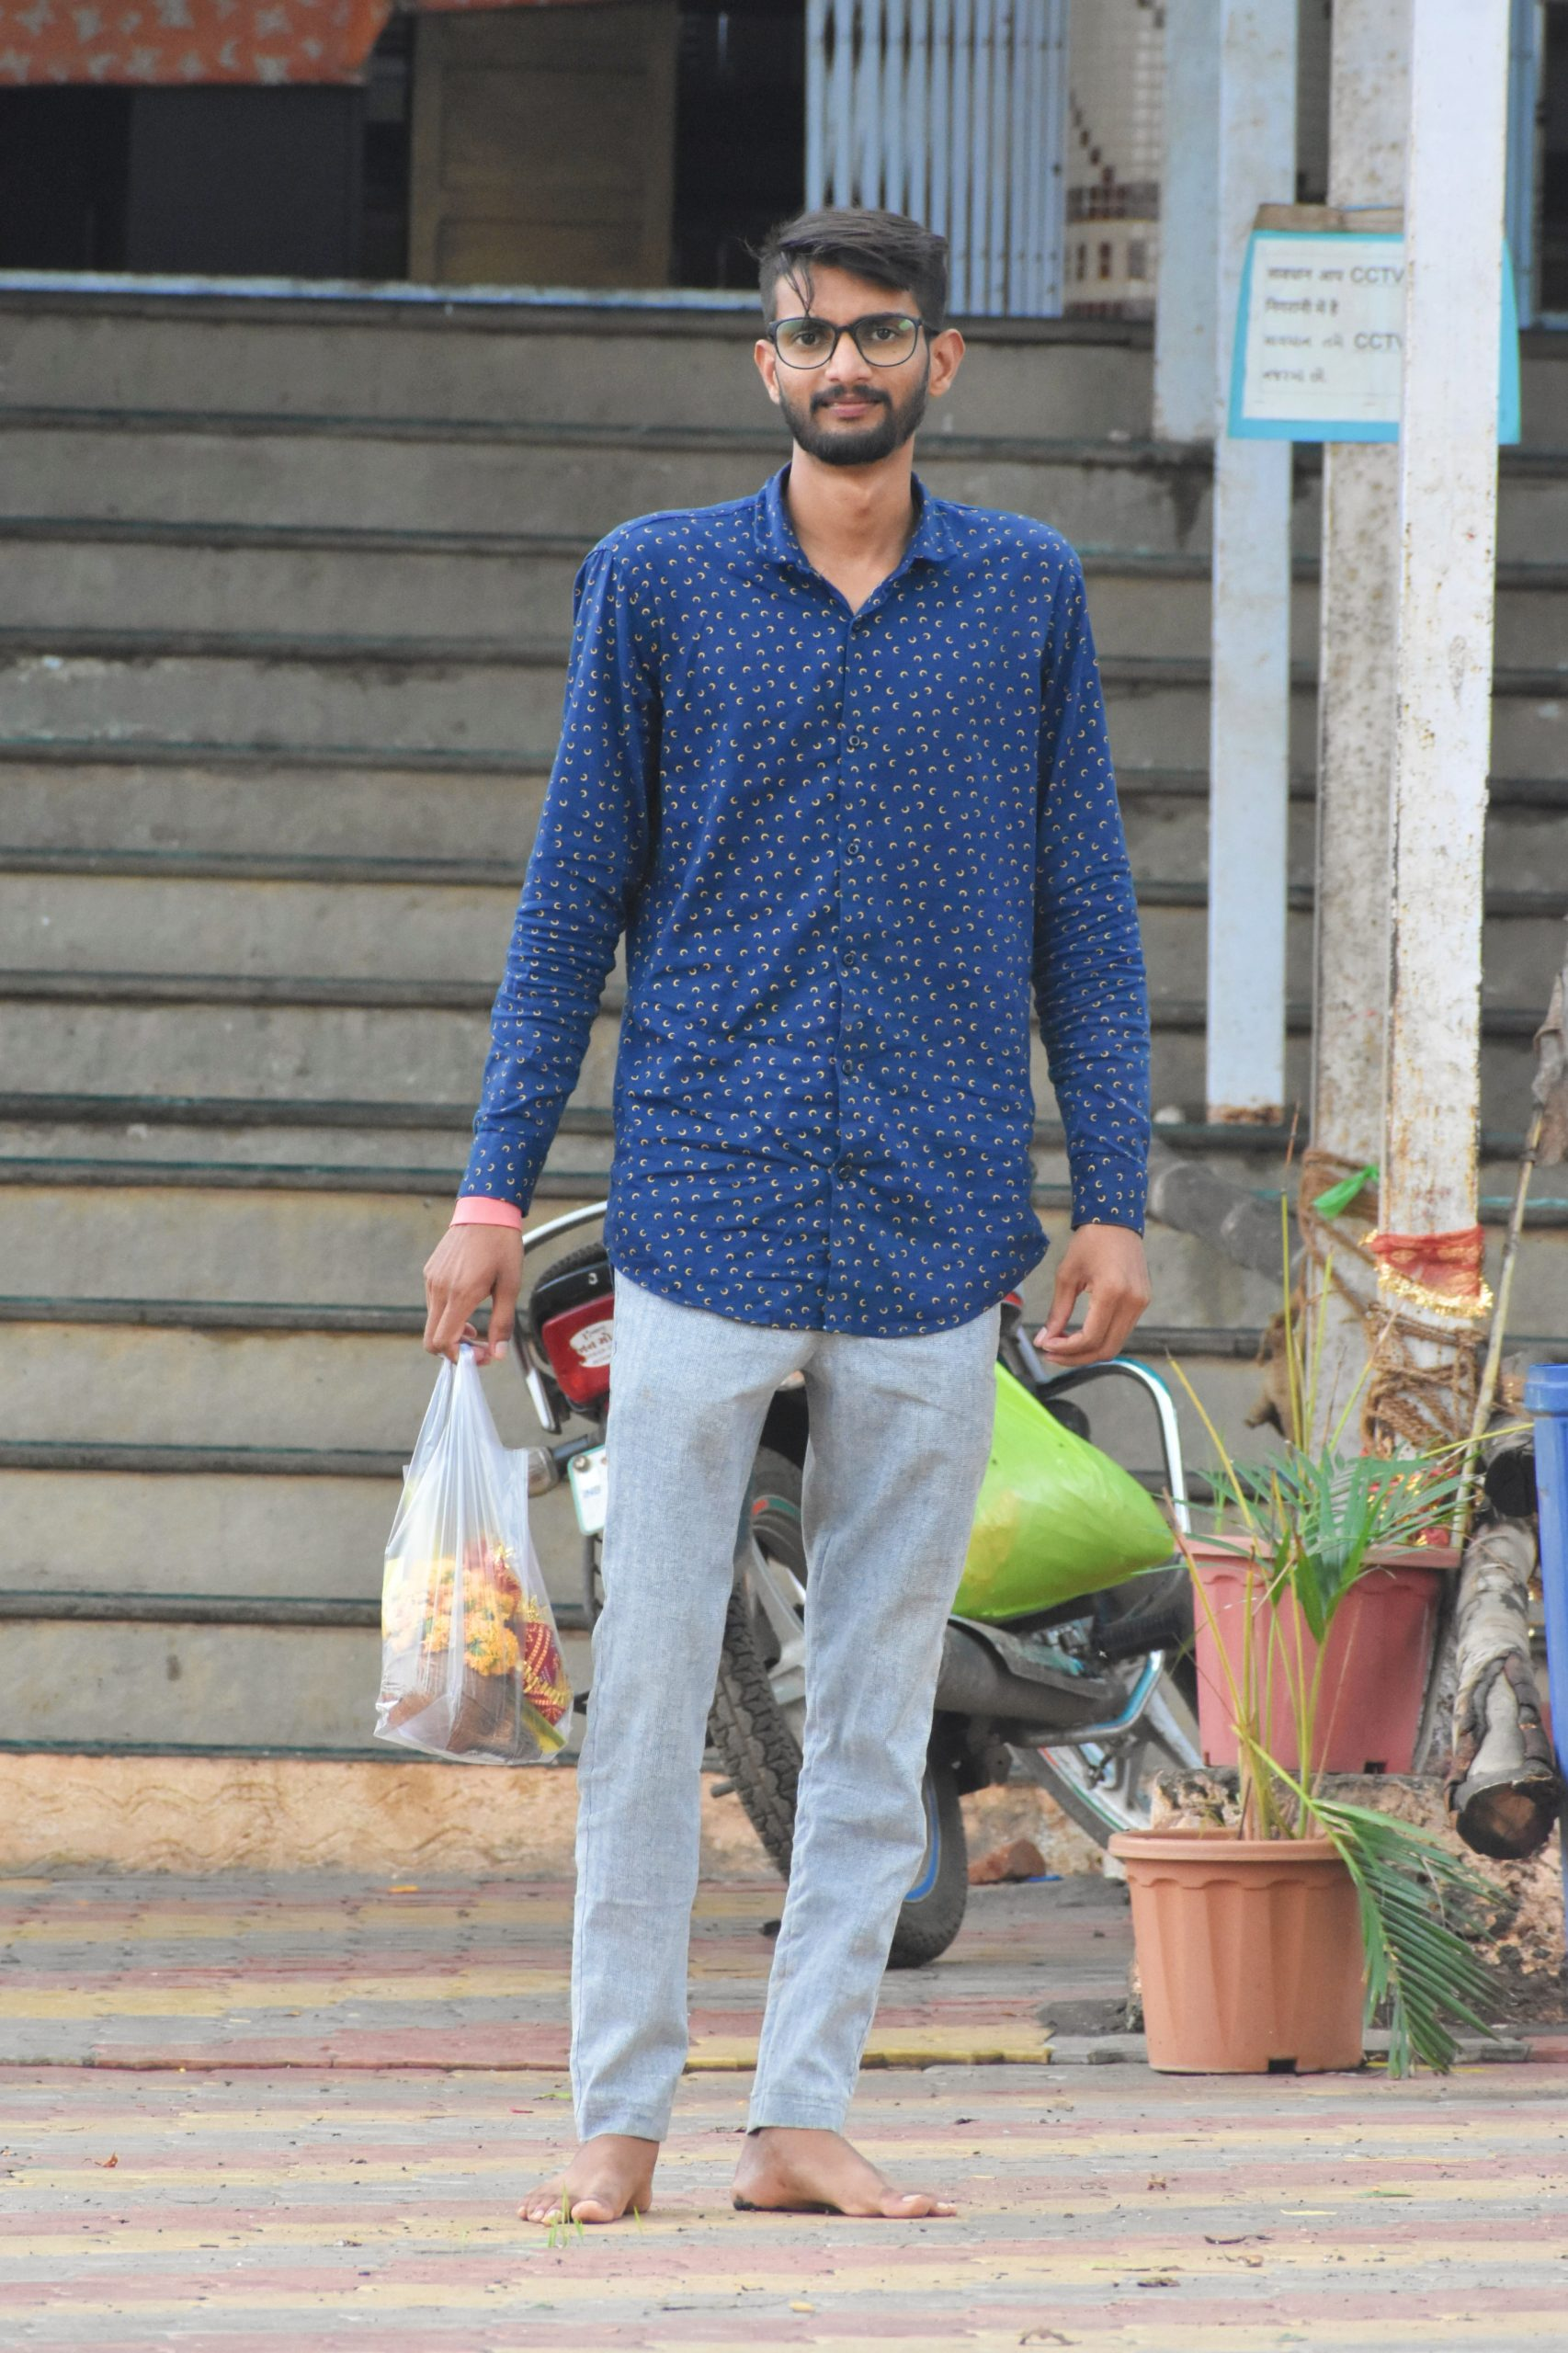 A boy with a carry bag